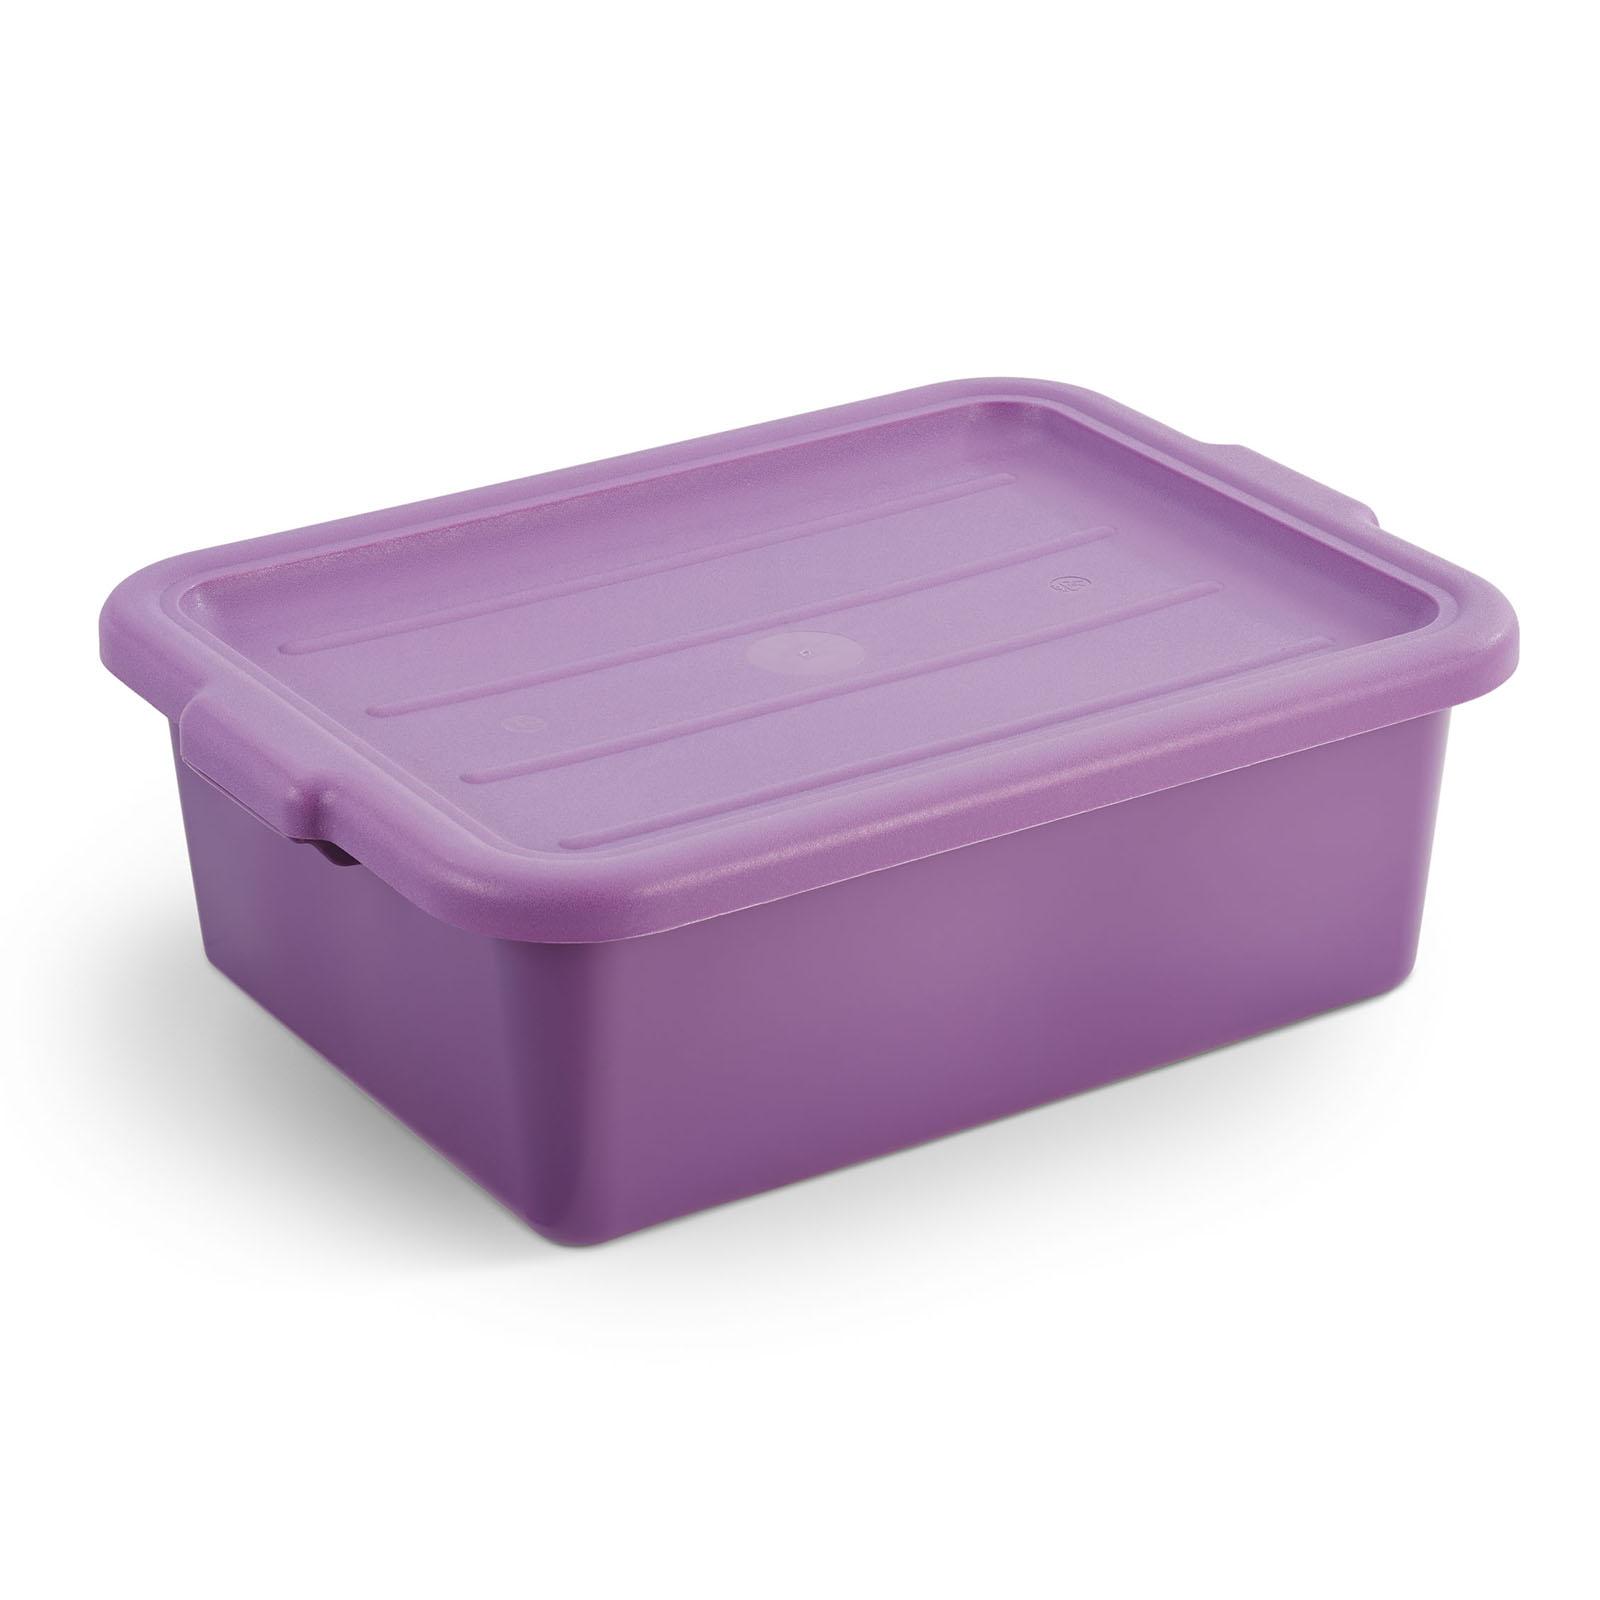 Vollrath 1527B-C80 food storage container, box